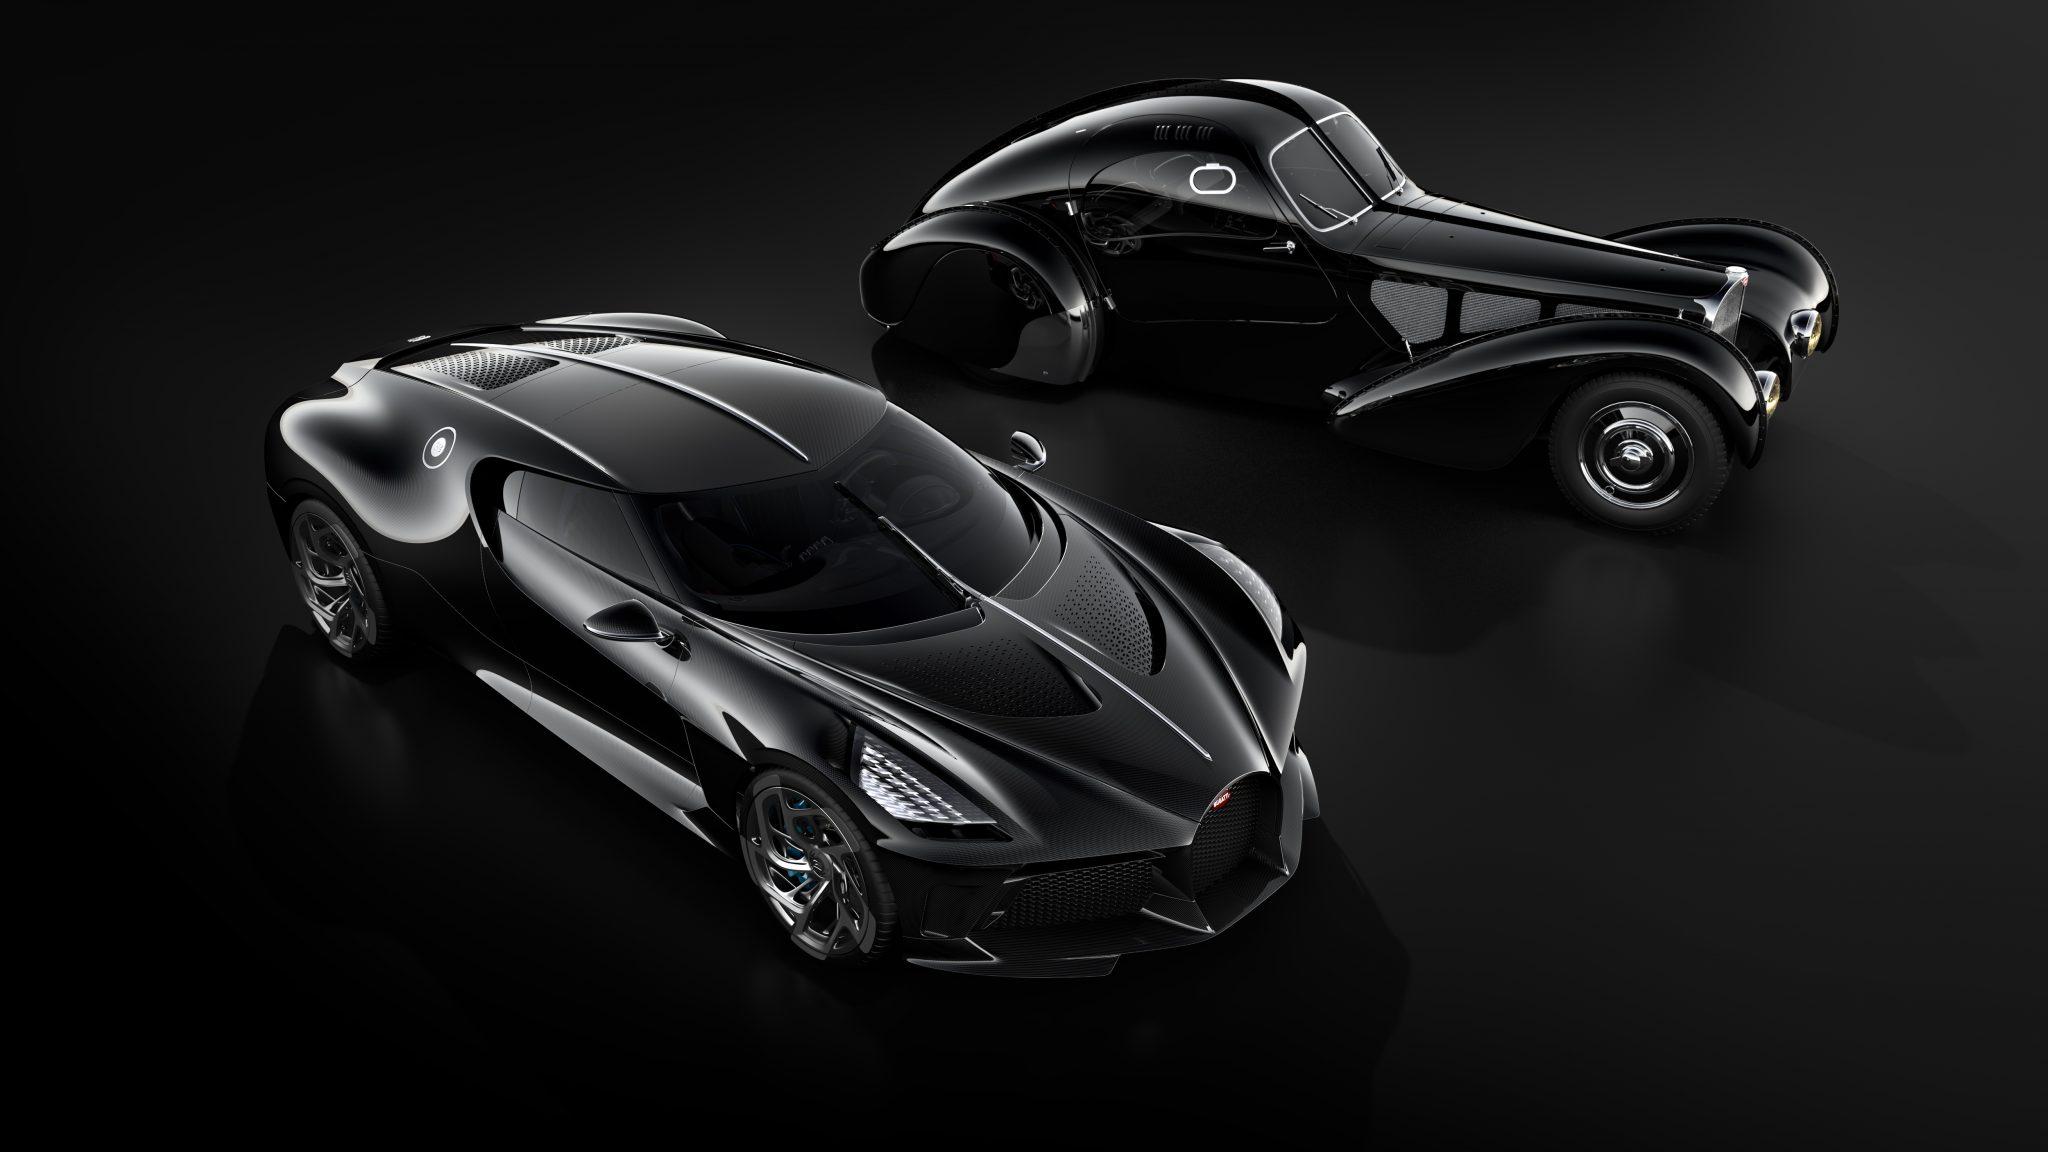 Bugatti La Voiture Noire vs Type 57 SC Atlantic